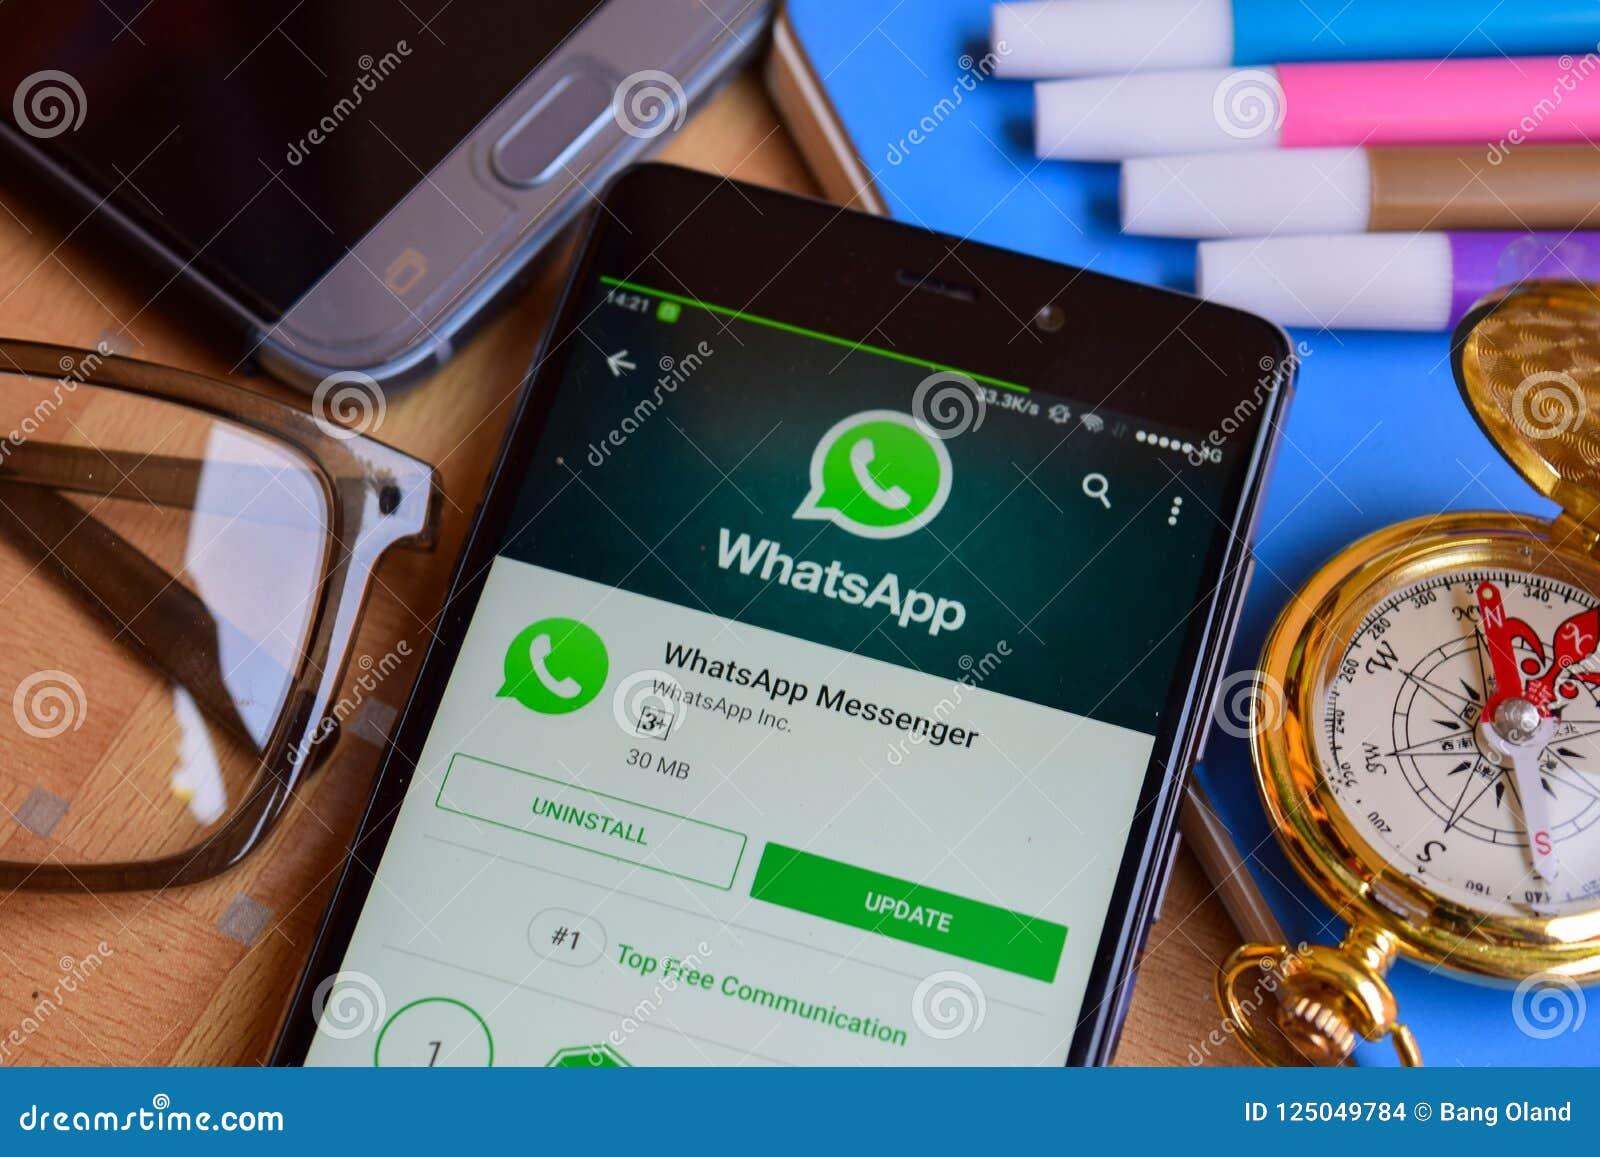 WhatsApp Messenger Dev App On Smartphone Screen  Editorial Stock